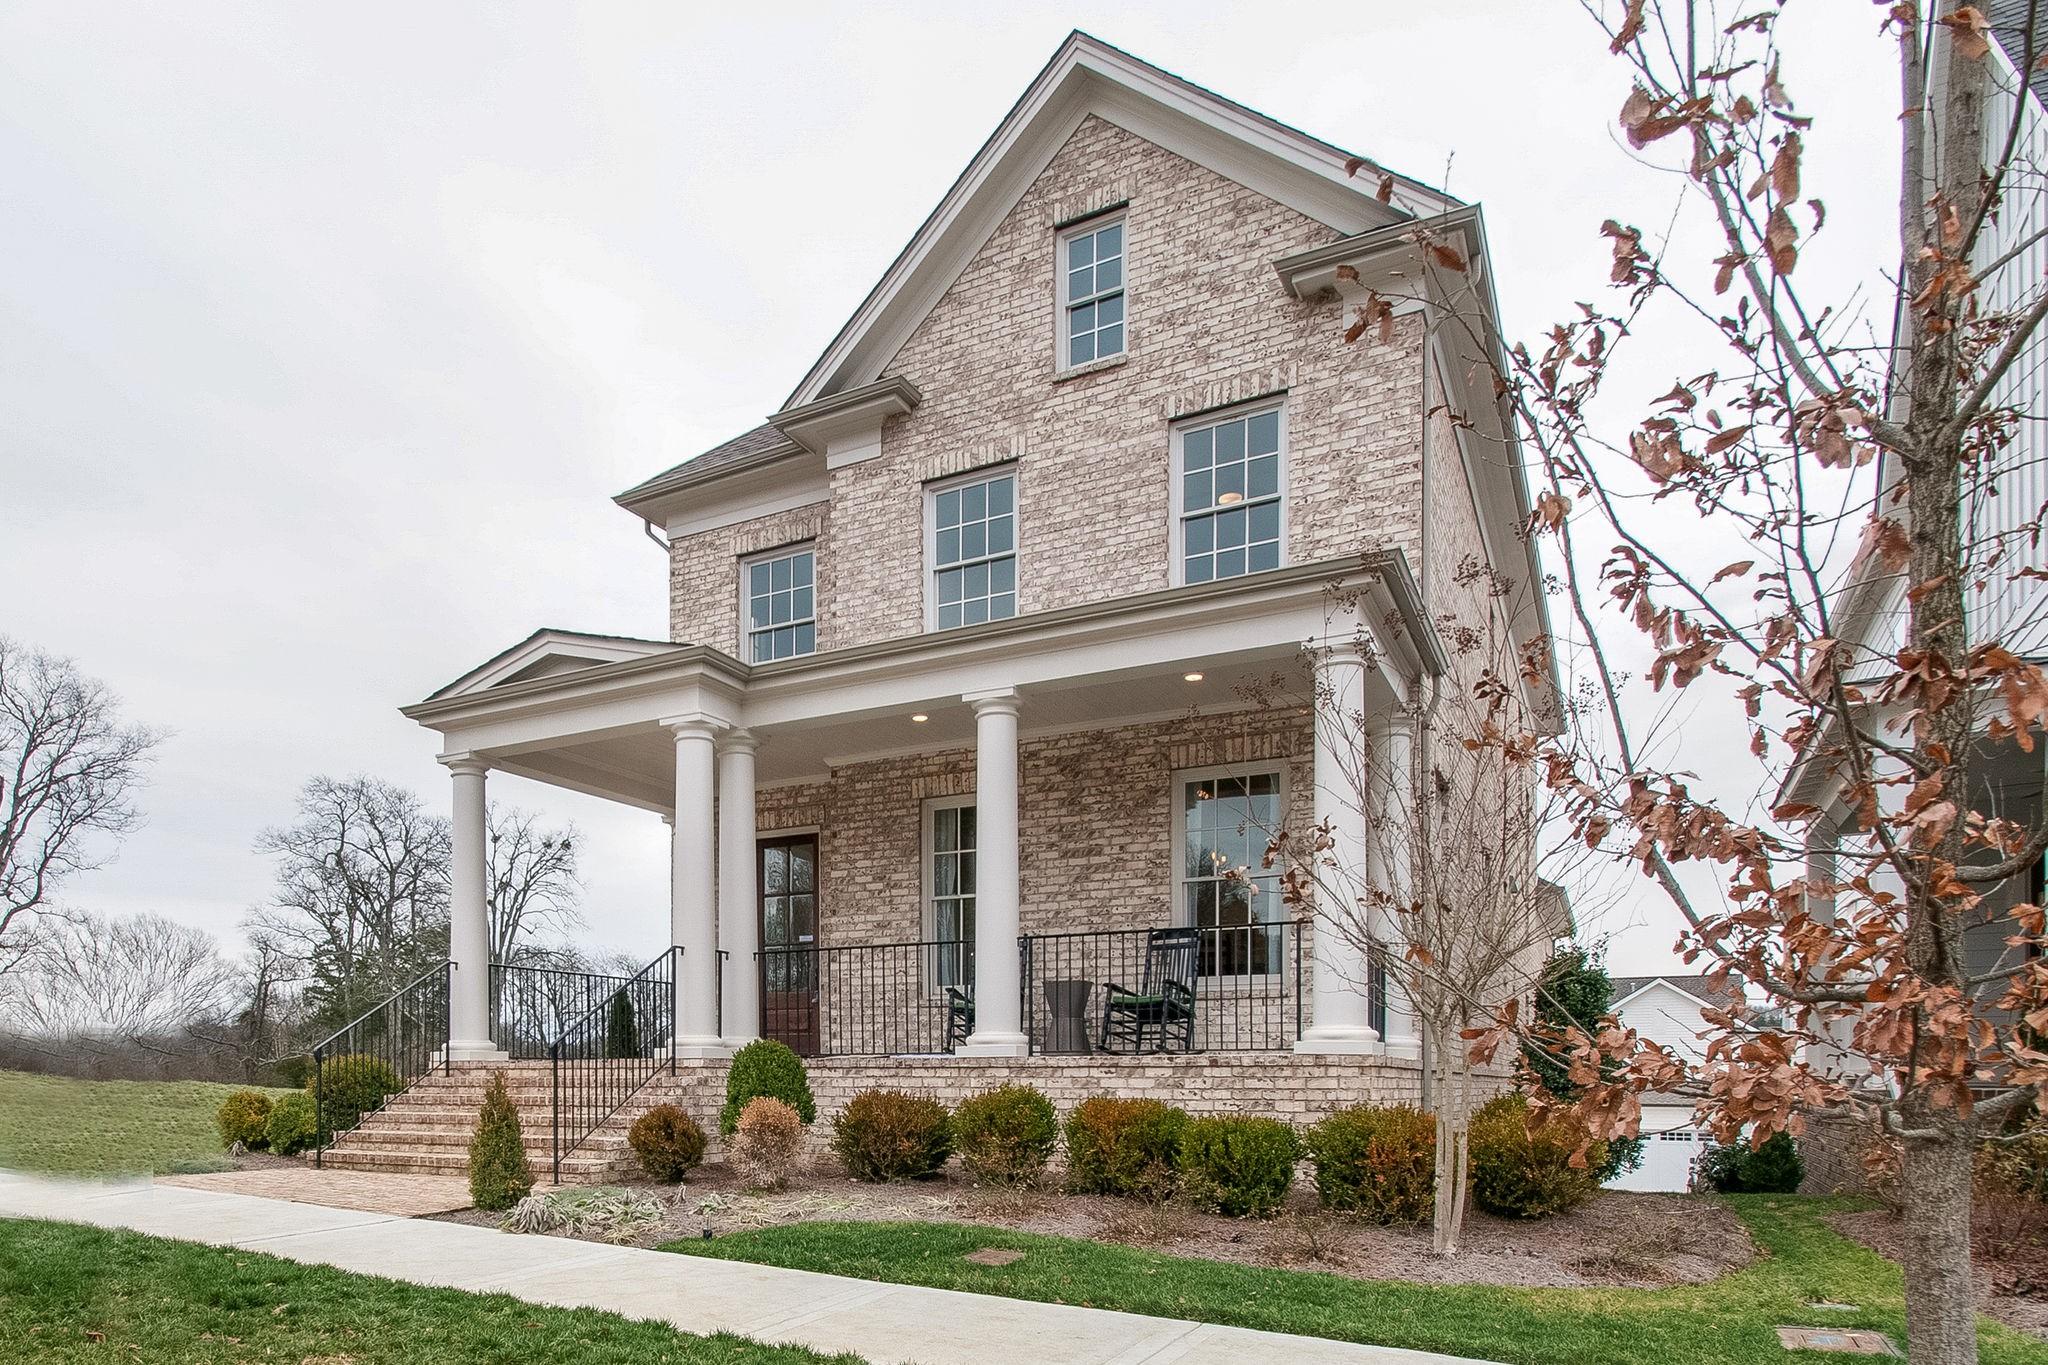 221 Stephens Valley Blvd, Nashville, TN 37221 - Nashville, TN real estate listing